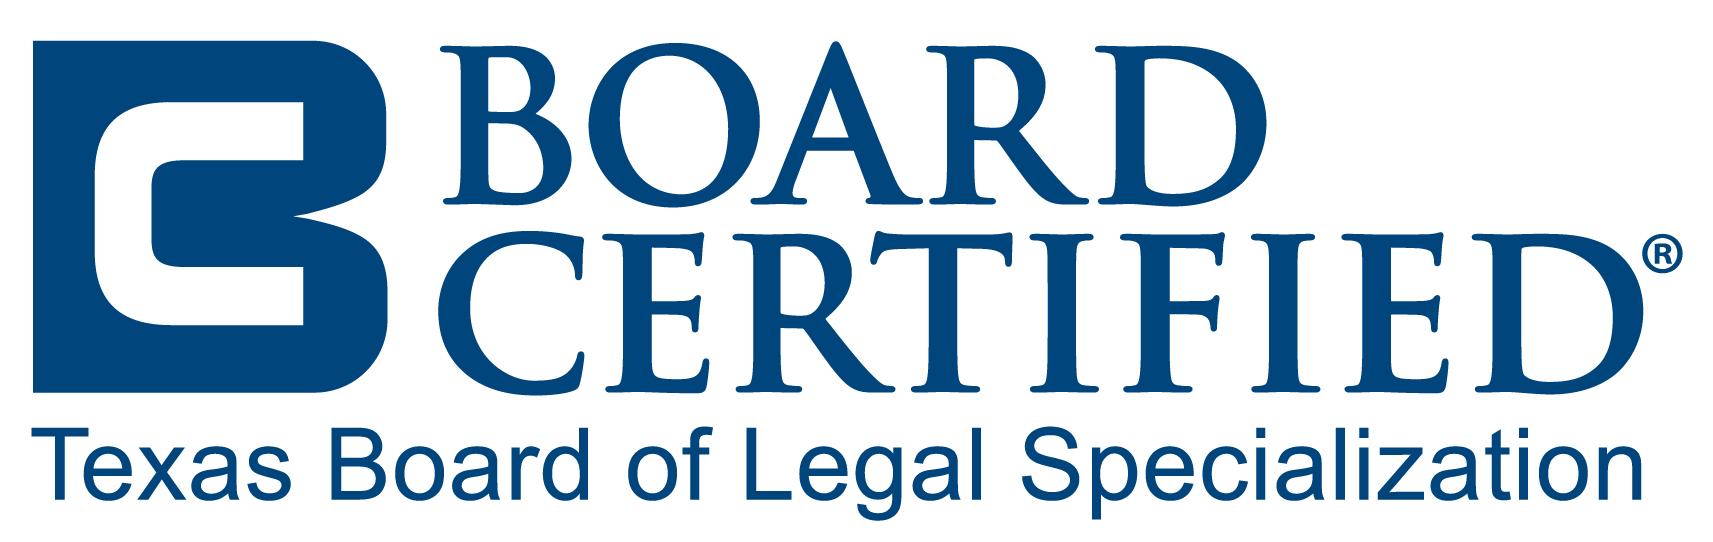 Texas Personal Injury Attorney Board Certified Jones